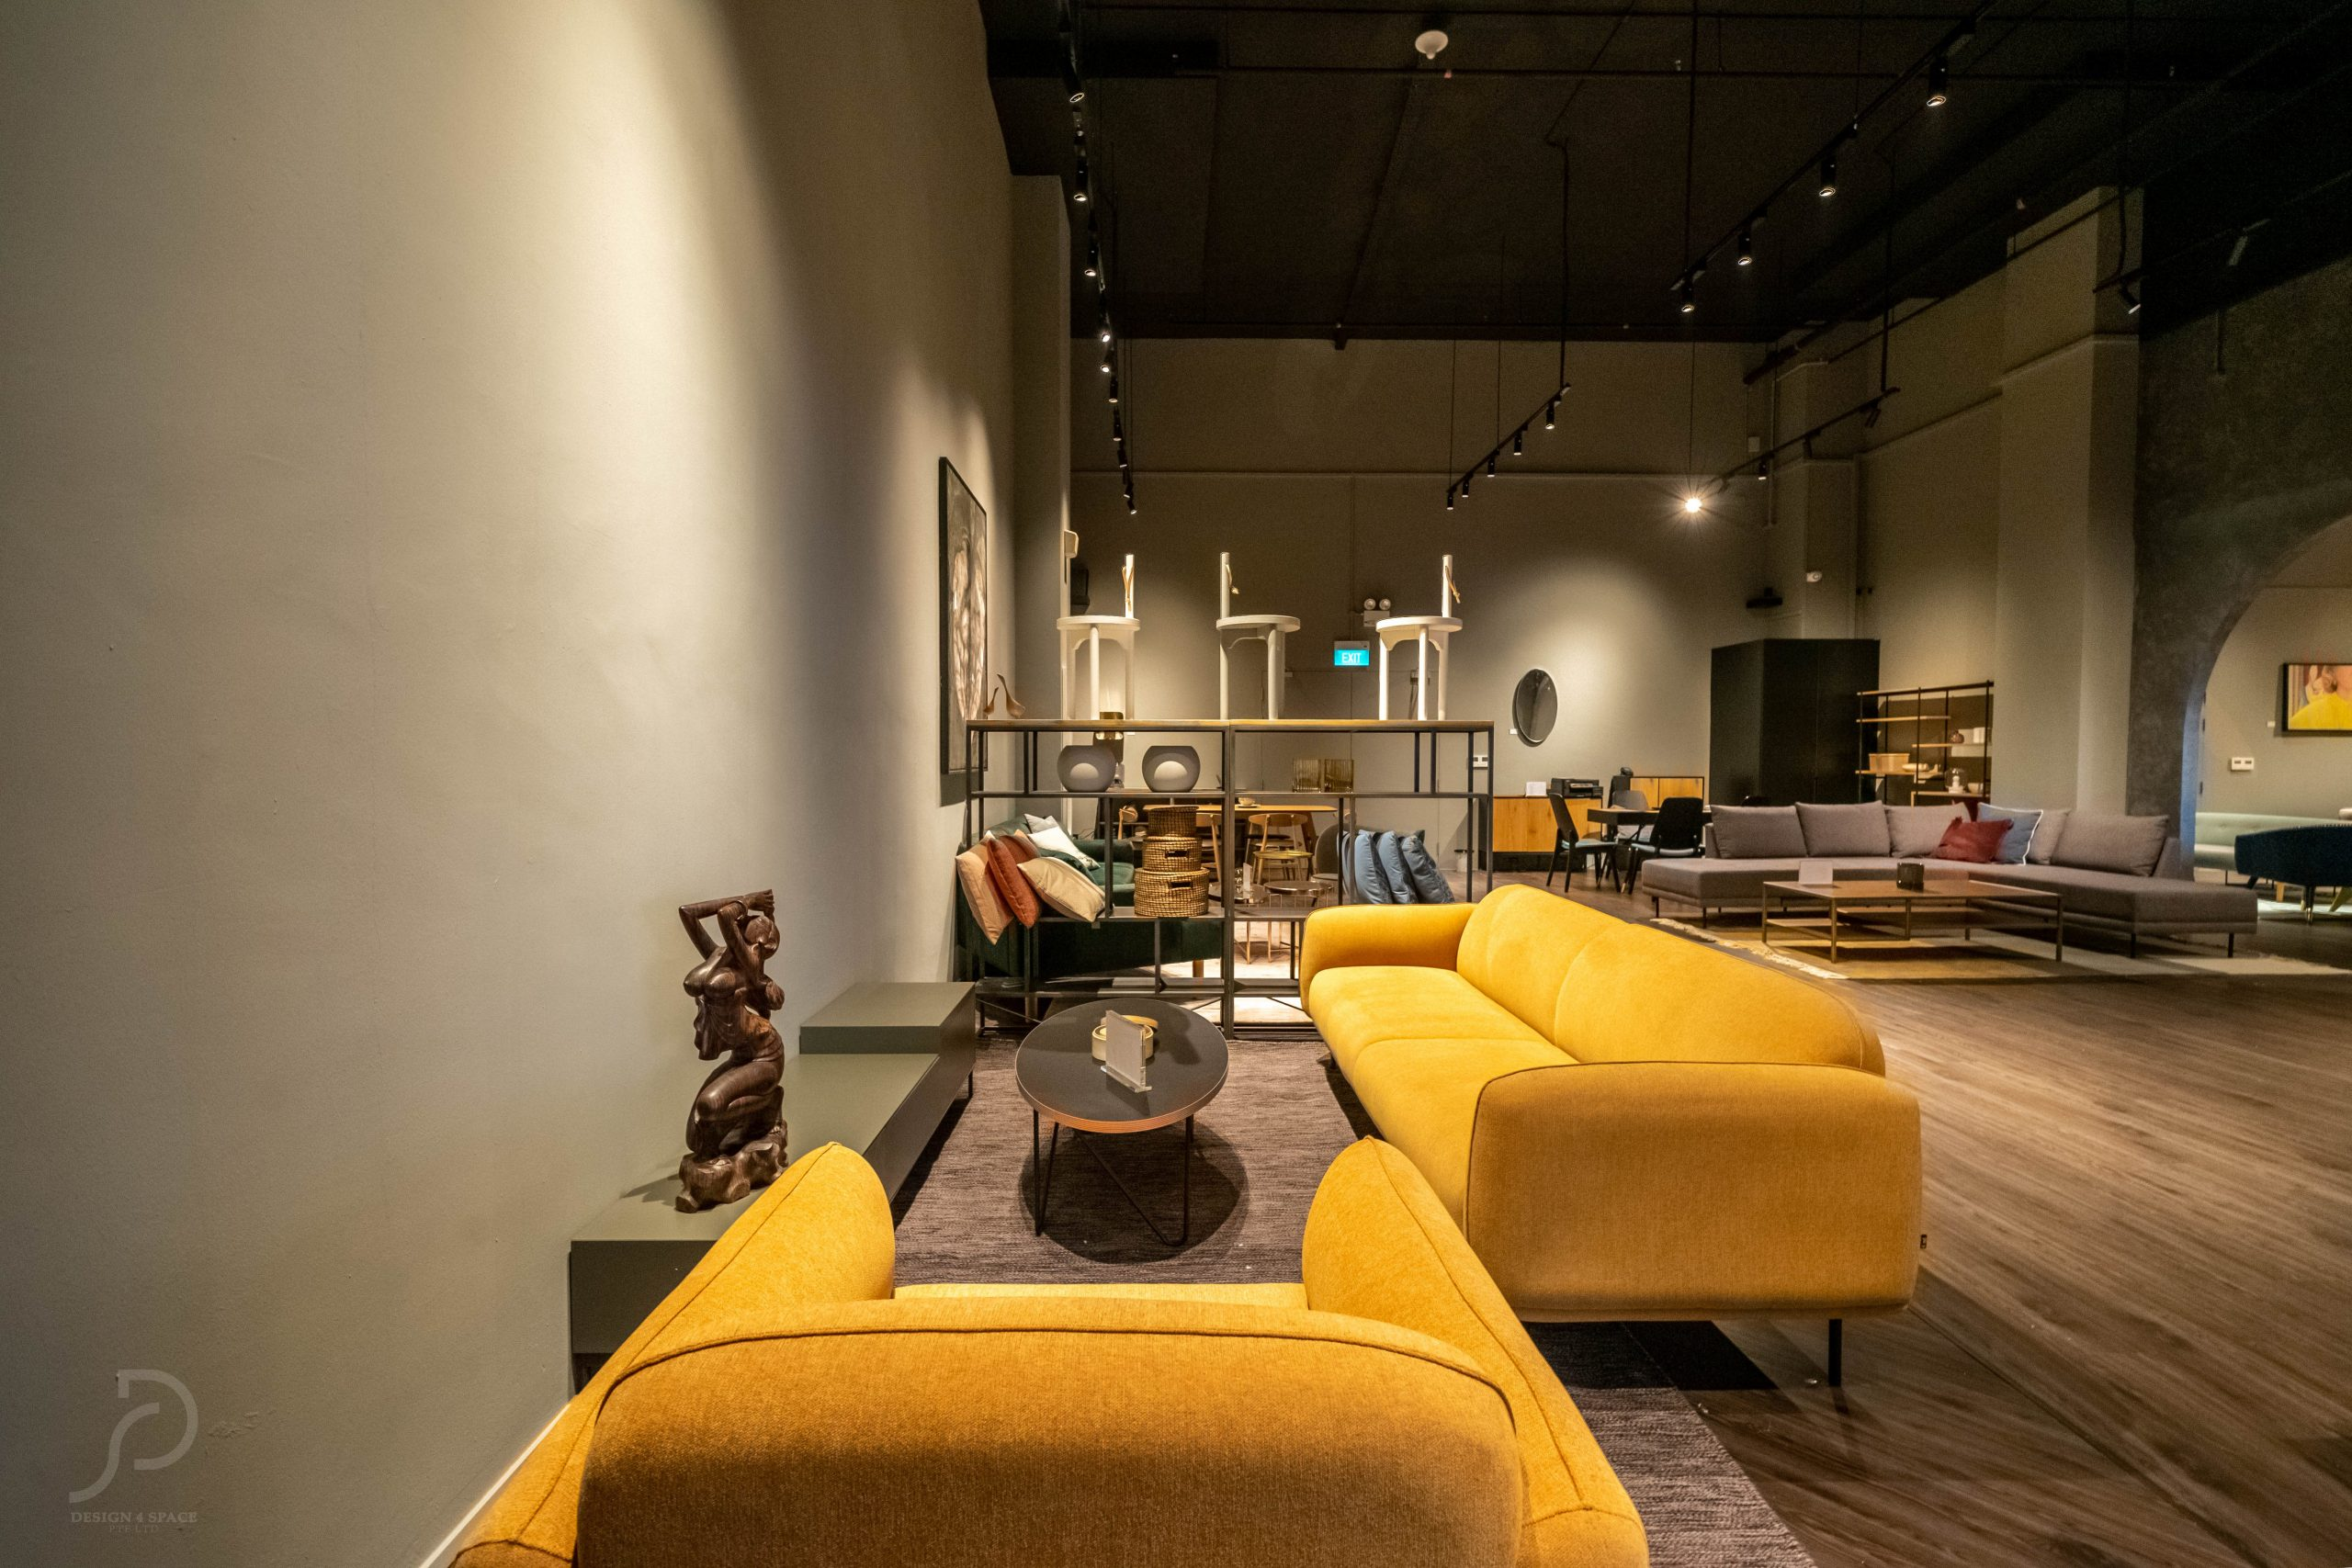 Furniture boutique6